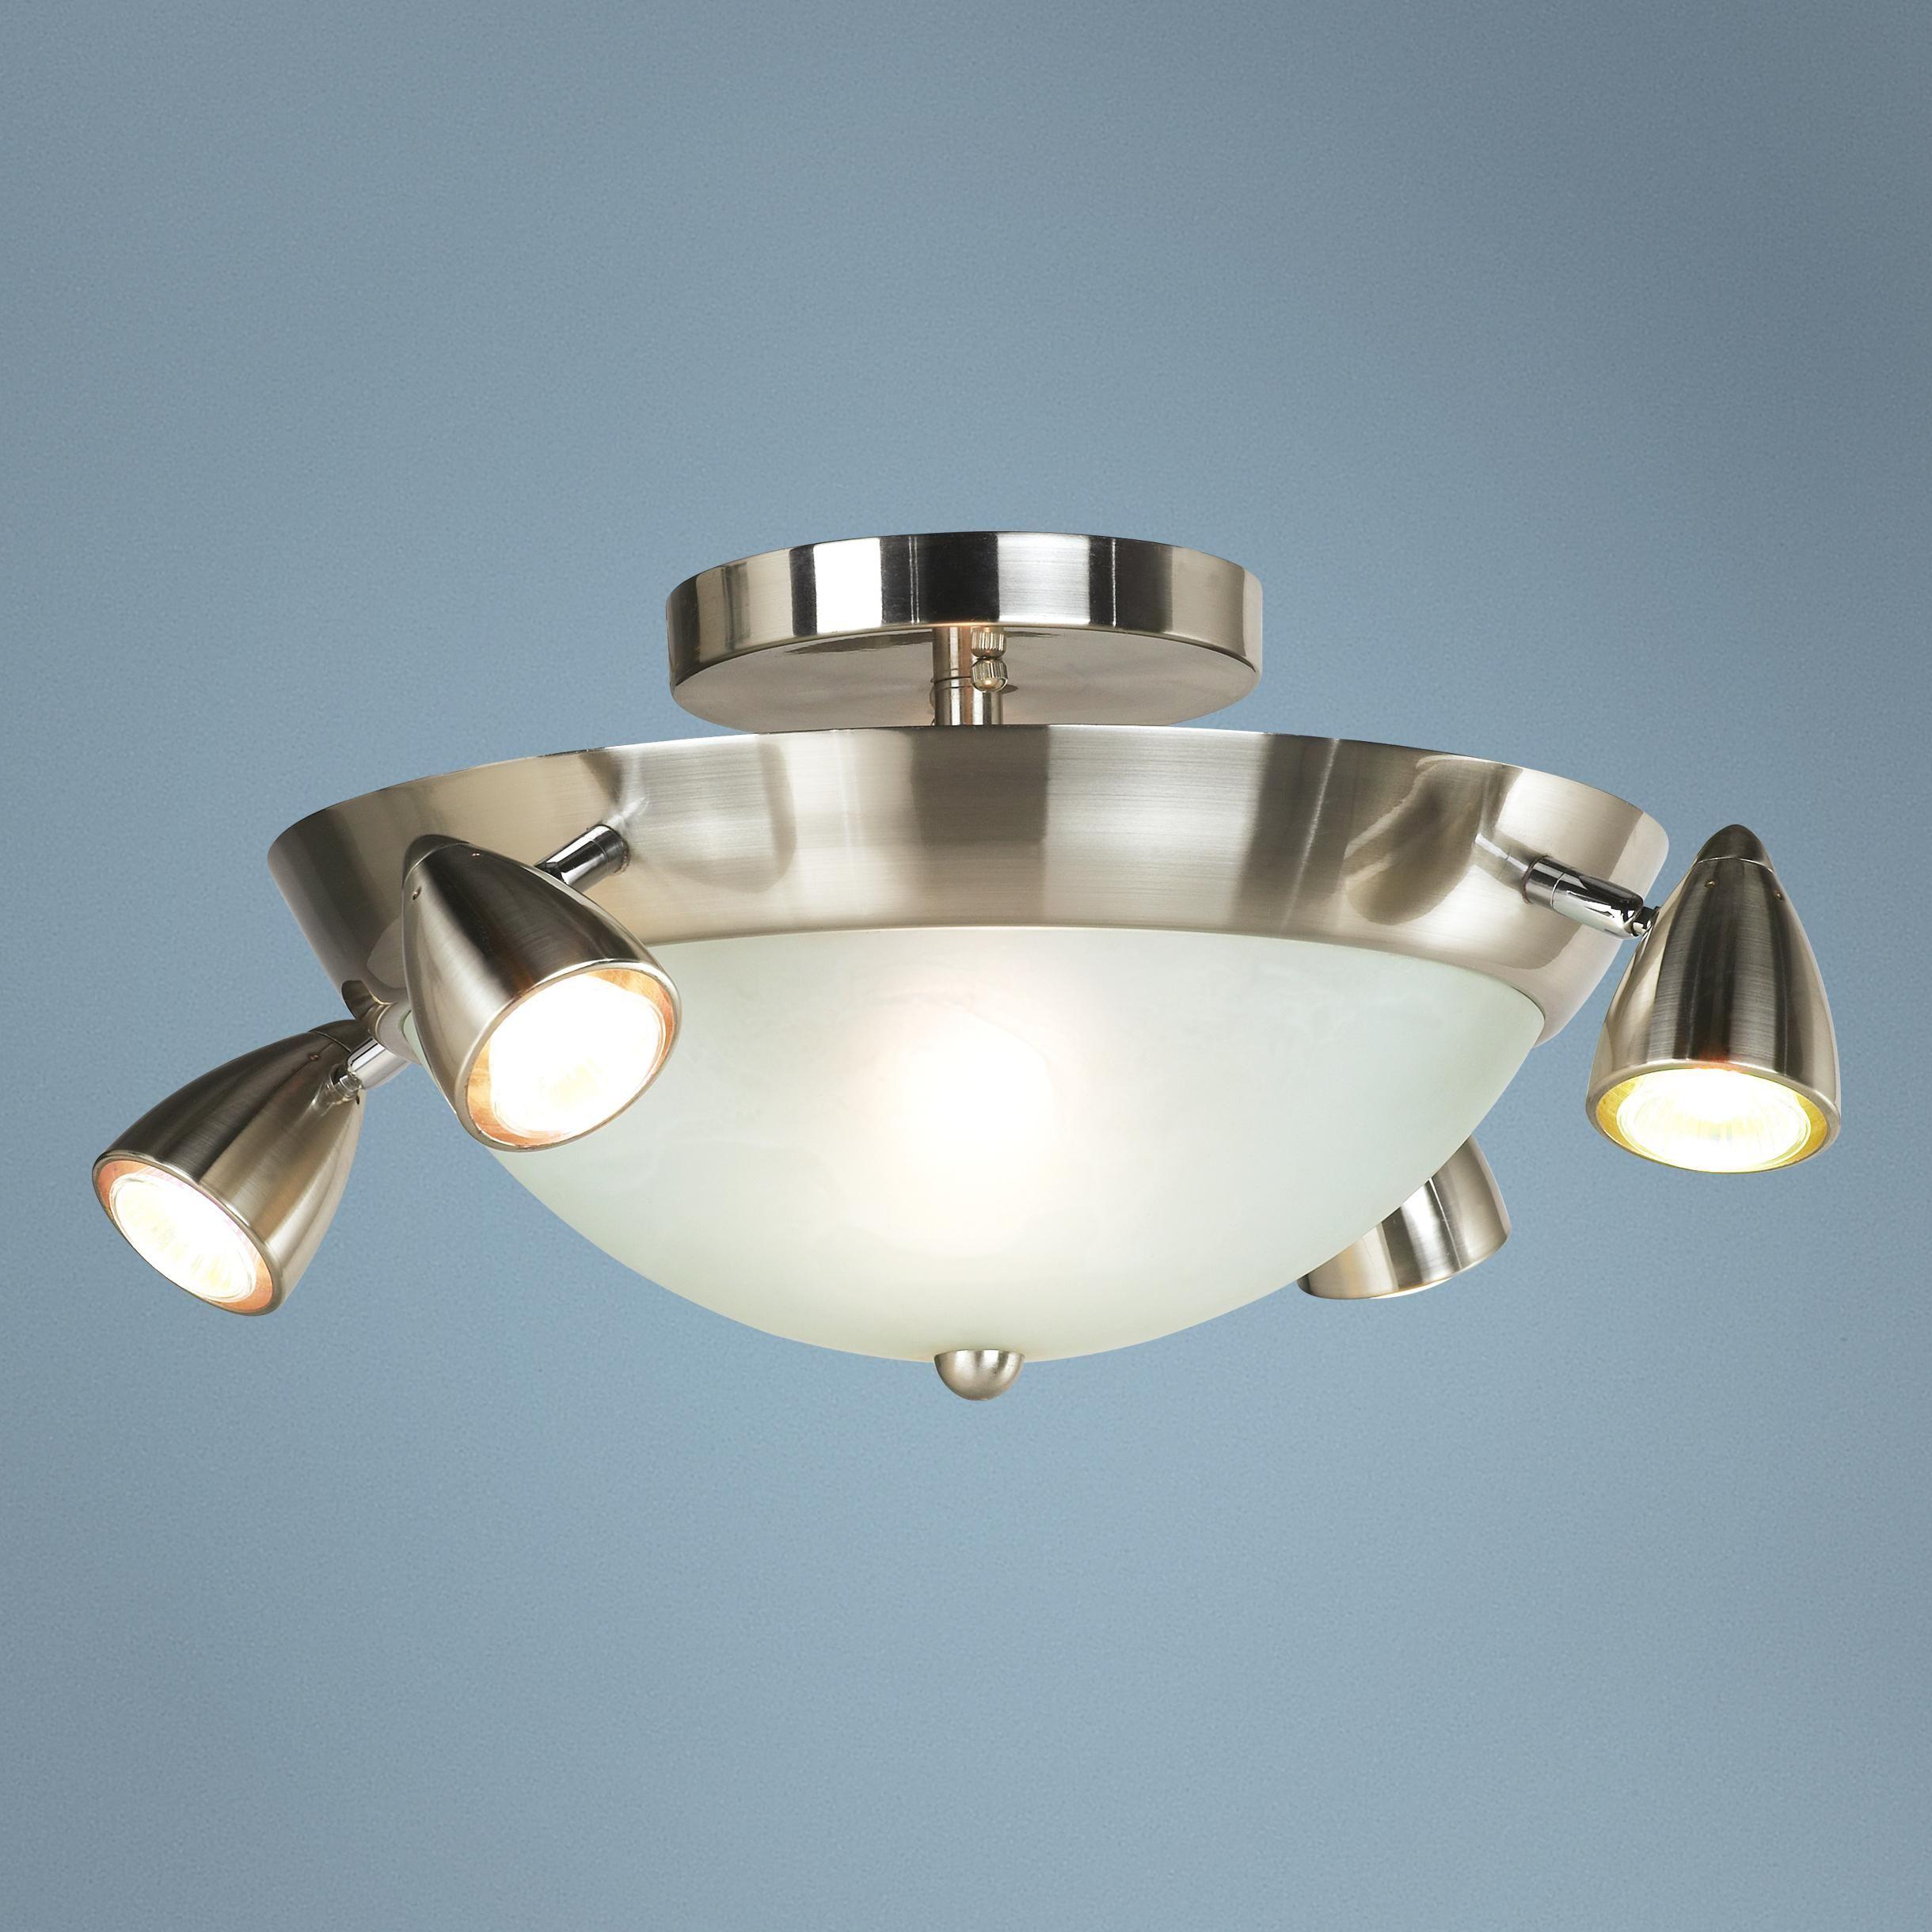 "Lighting Basement Washroom Stairs: Adjustable Bullet Head 20 1/2"" Wide Ceiling Light Fixture"